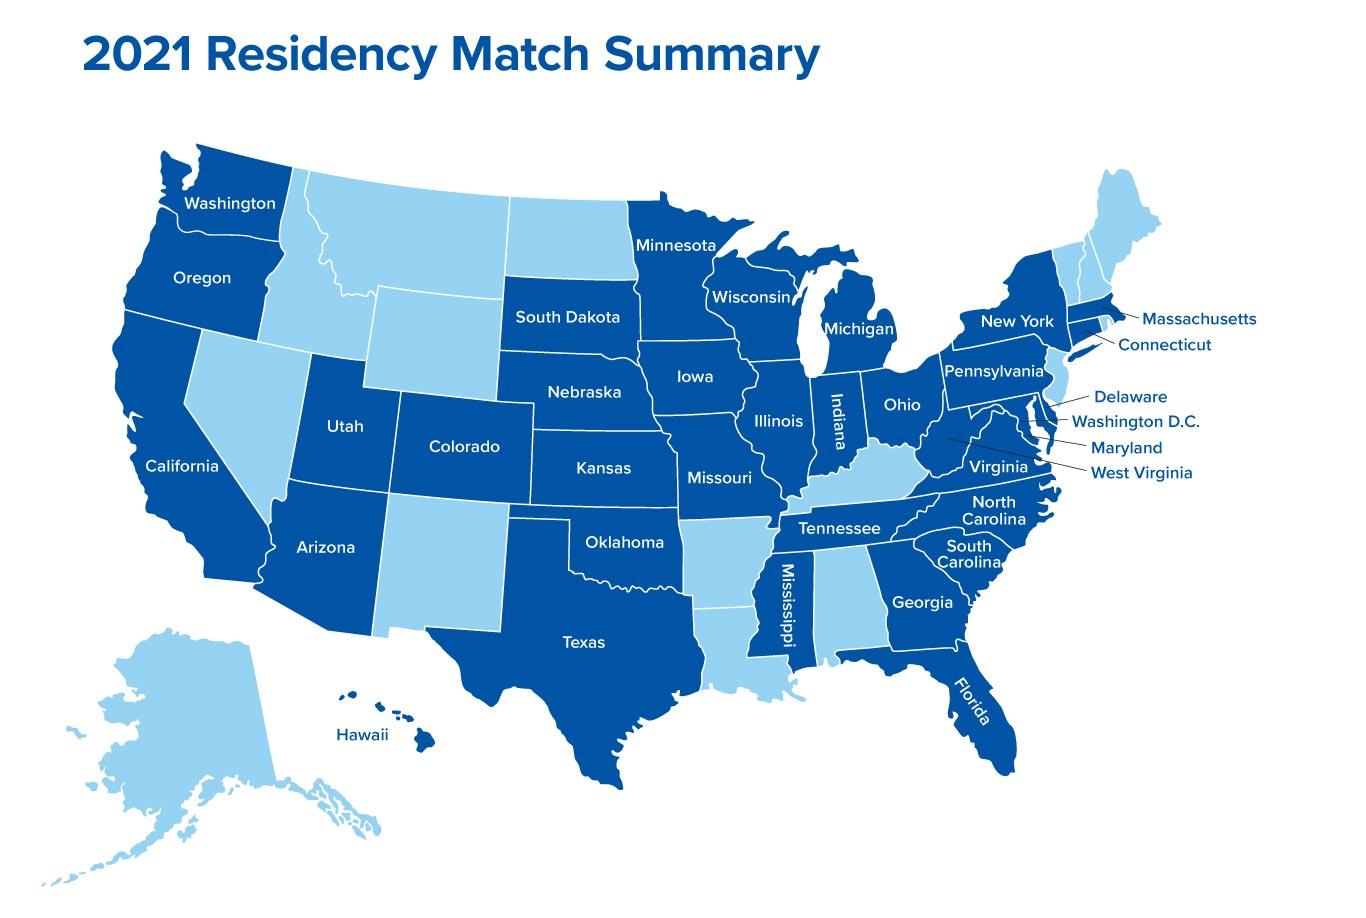 2021 Residency Match States